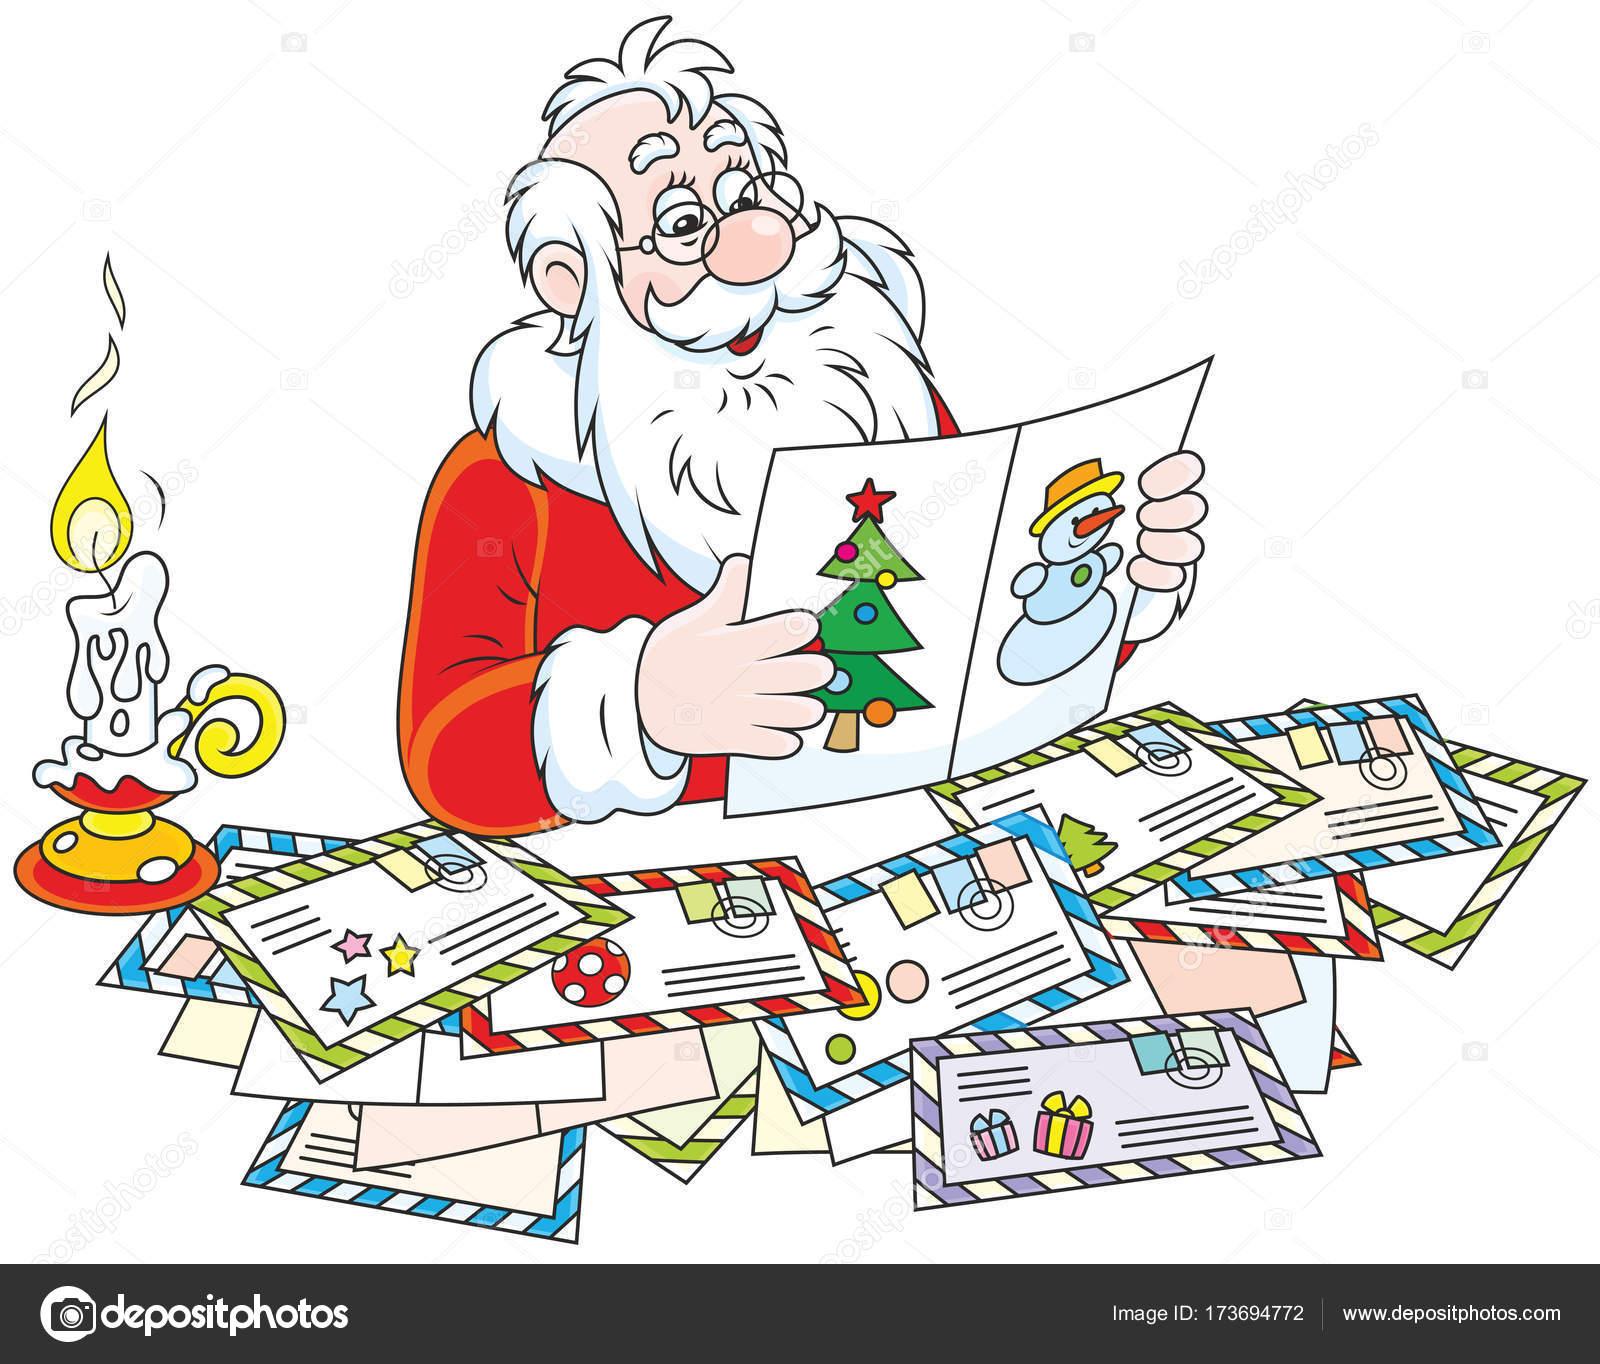 Le Lettere Di Babbo Natale.Lettere Di Babbo Natale Lettura Vettoriali Stock C Alexbannykh